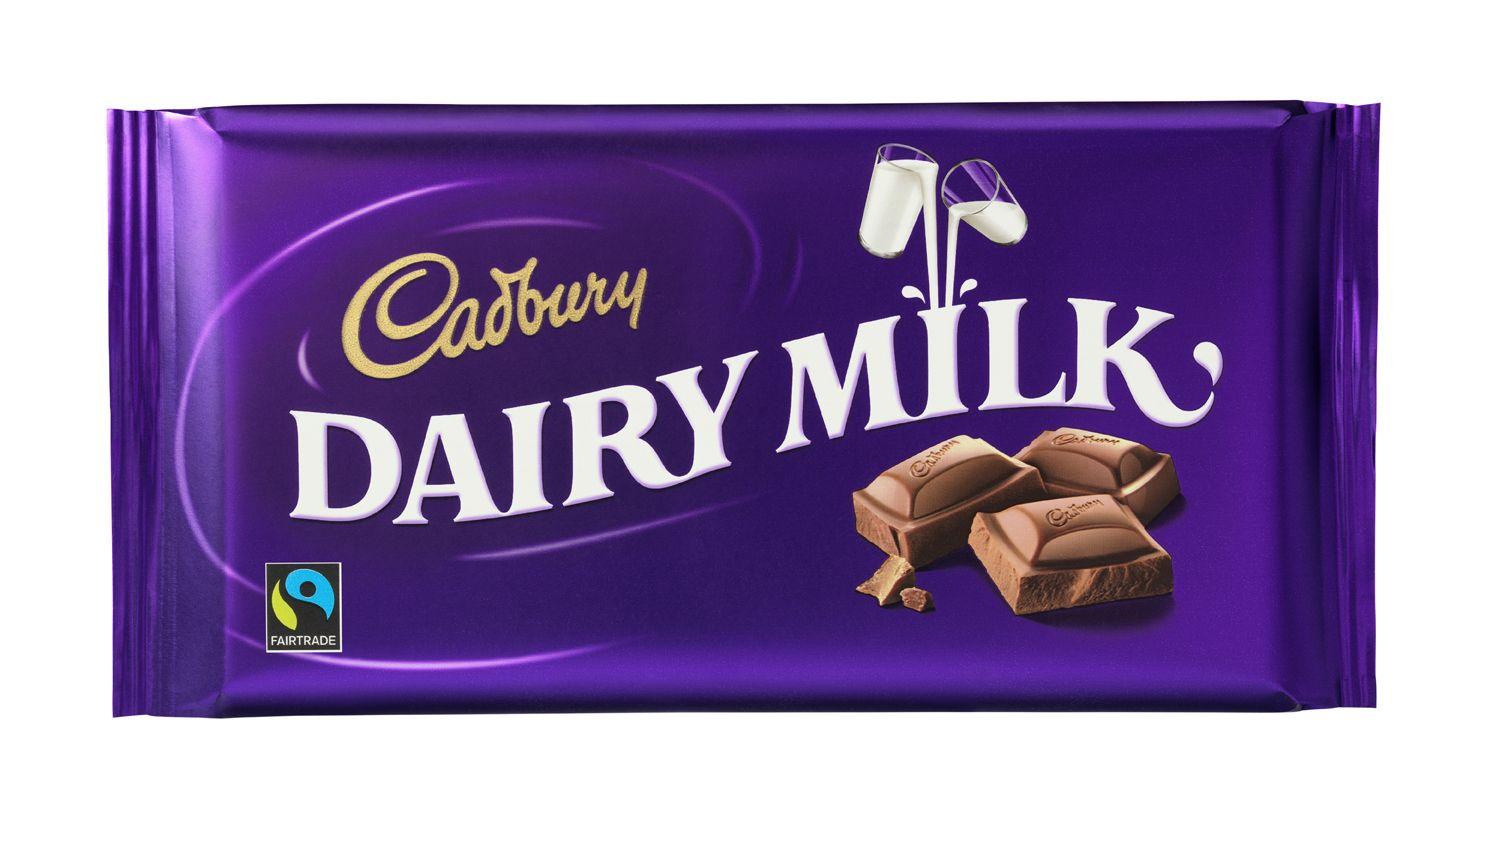 cadbury dairy milk 4p s Cadbury dairy milk, 5 star, perk, clairs and celebrations marketing mix of cadbury : cadbury plc is a british confectionery company 4p of marketing, advertising campaigns, aesthetic design, business practices.